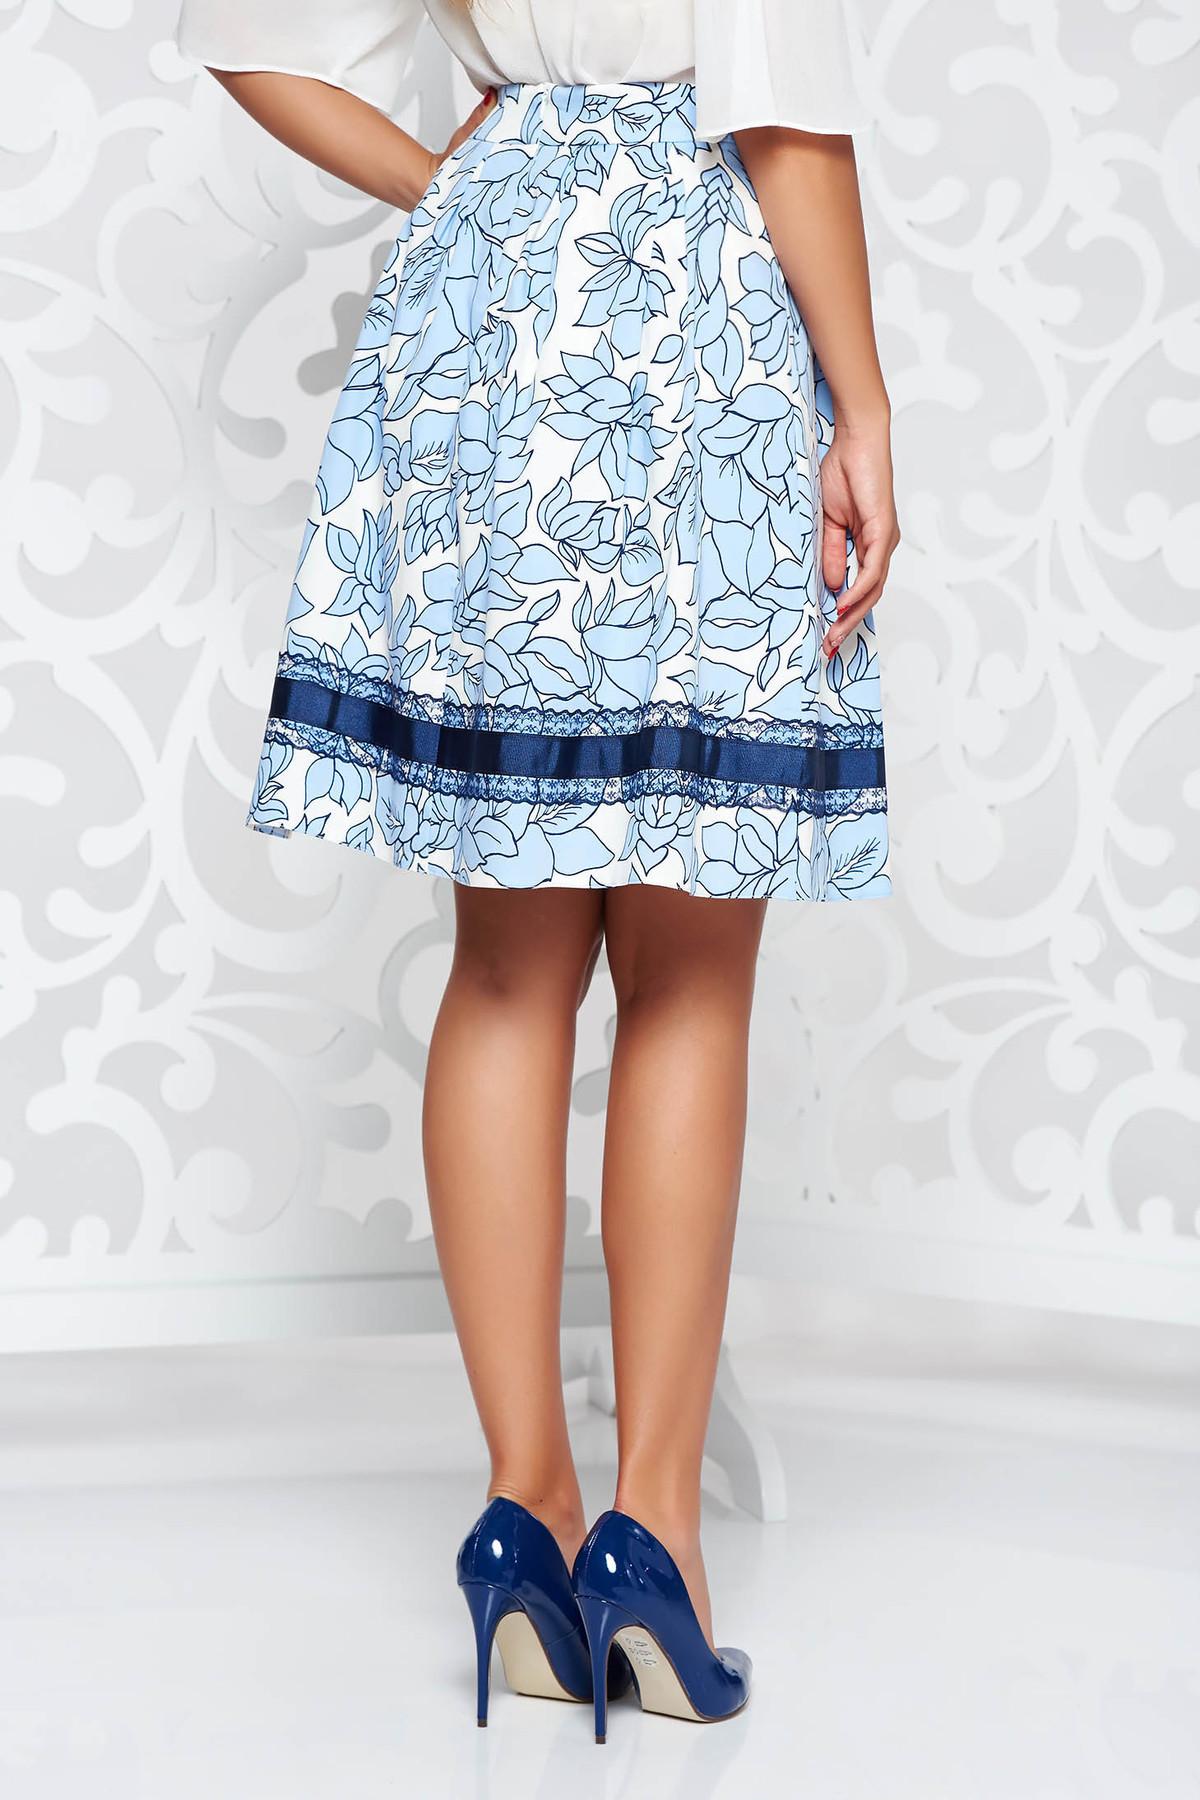 Fusta LaDonna albastra eleganta in clos din bumbac captusita pe interior cu aplicatii cusute manual